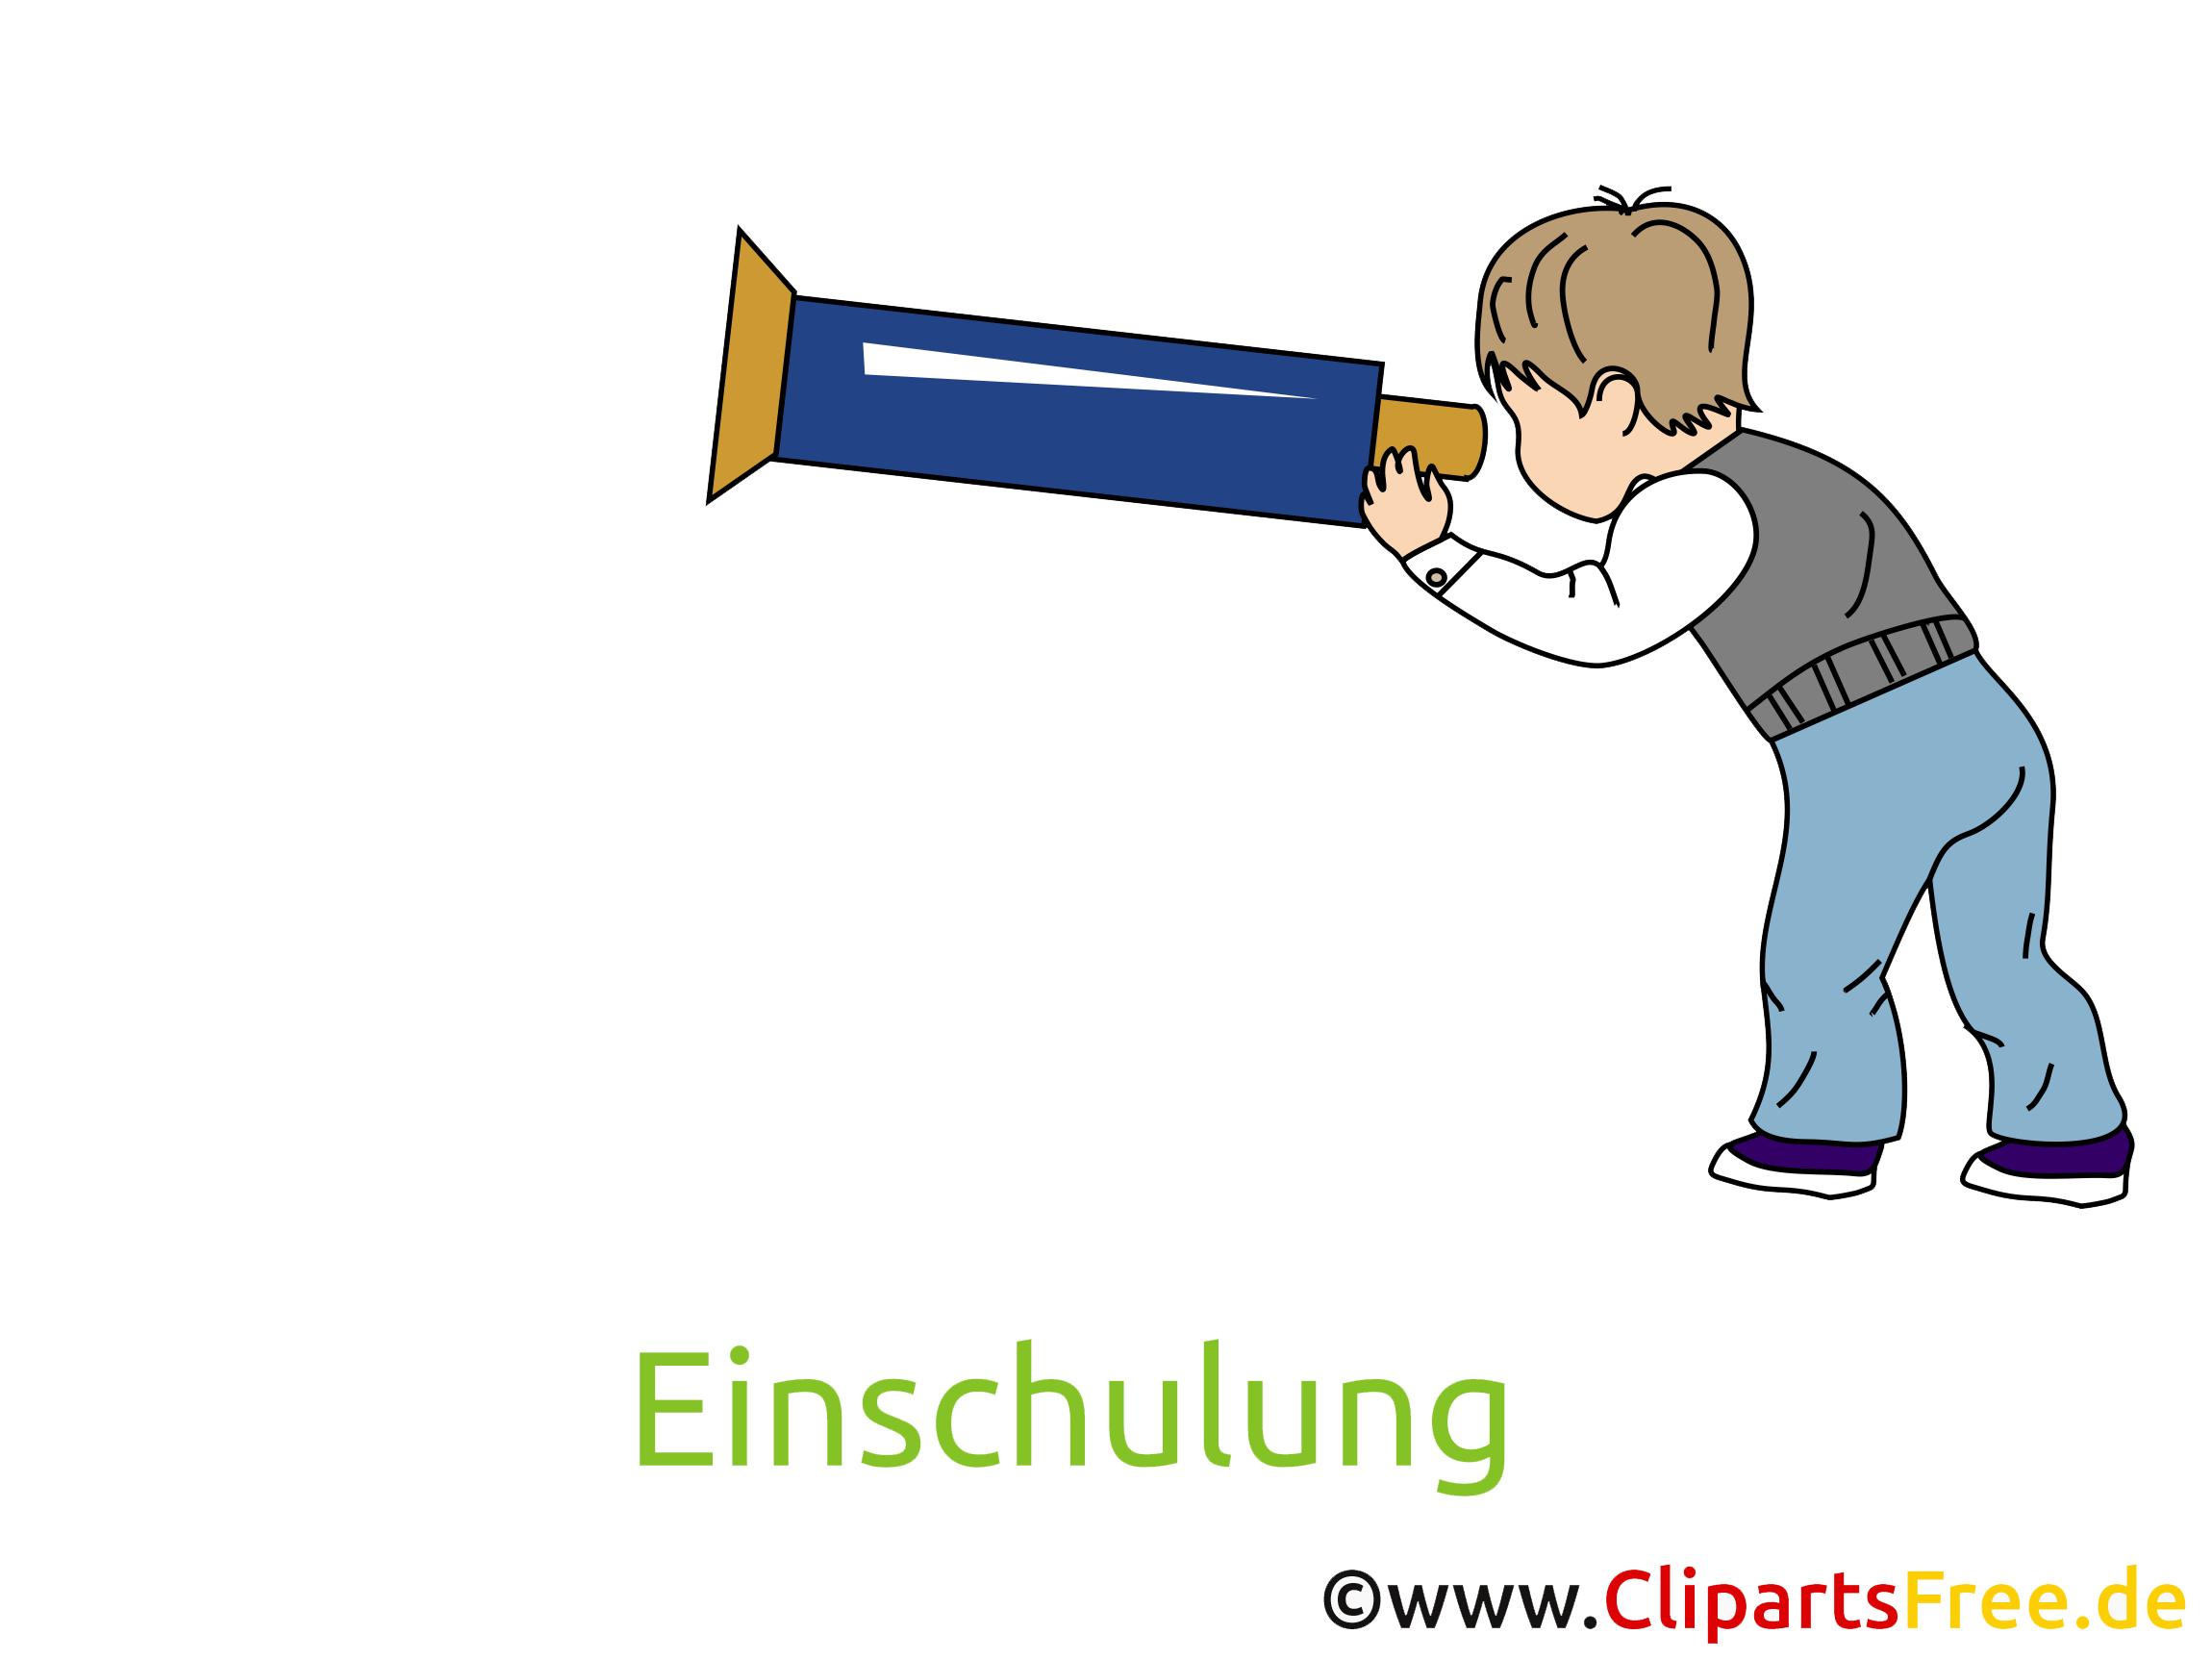 Schulkind Bild, Clipart, Cartoon gratis